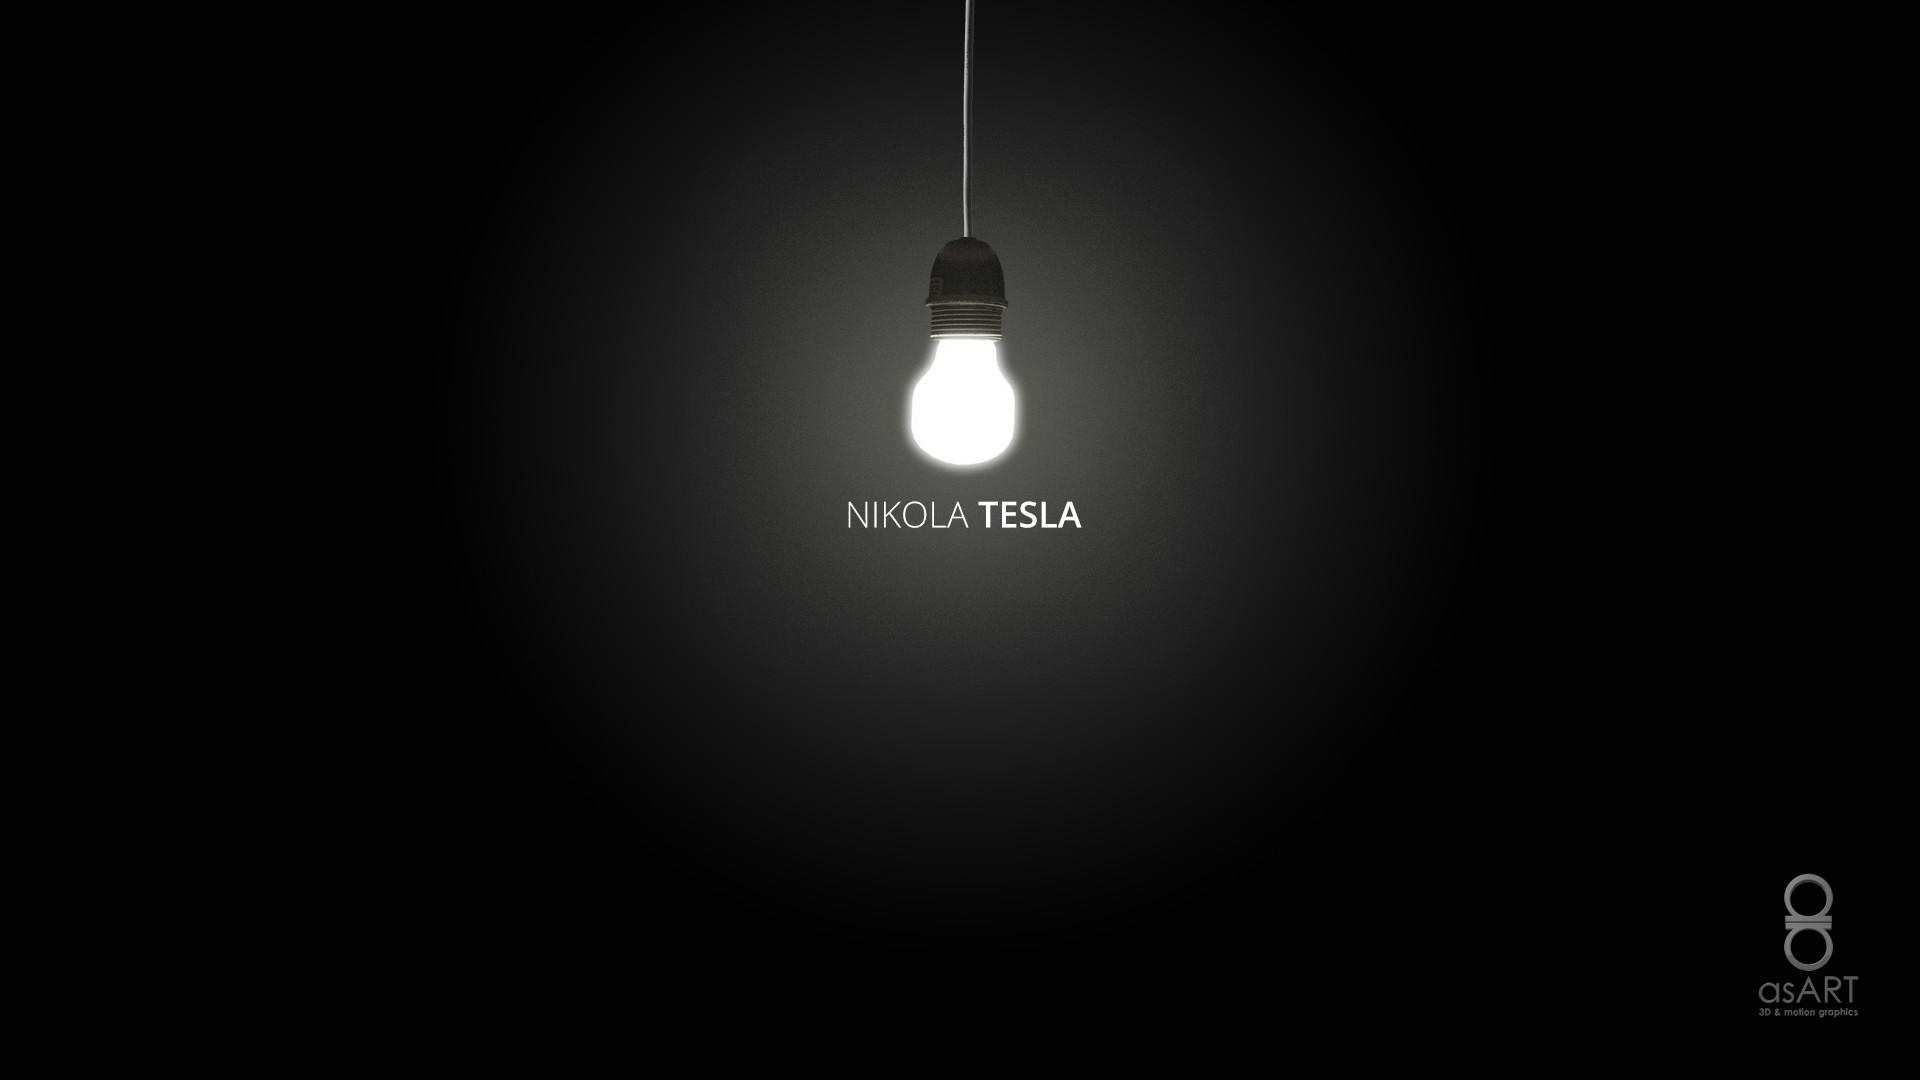 Nikola Tesla Wallpaper HD (67+ Images